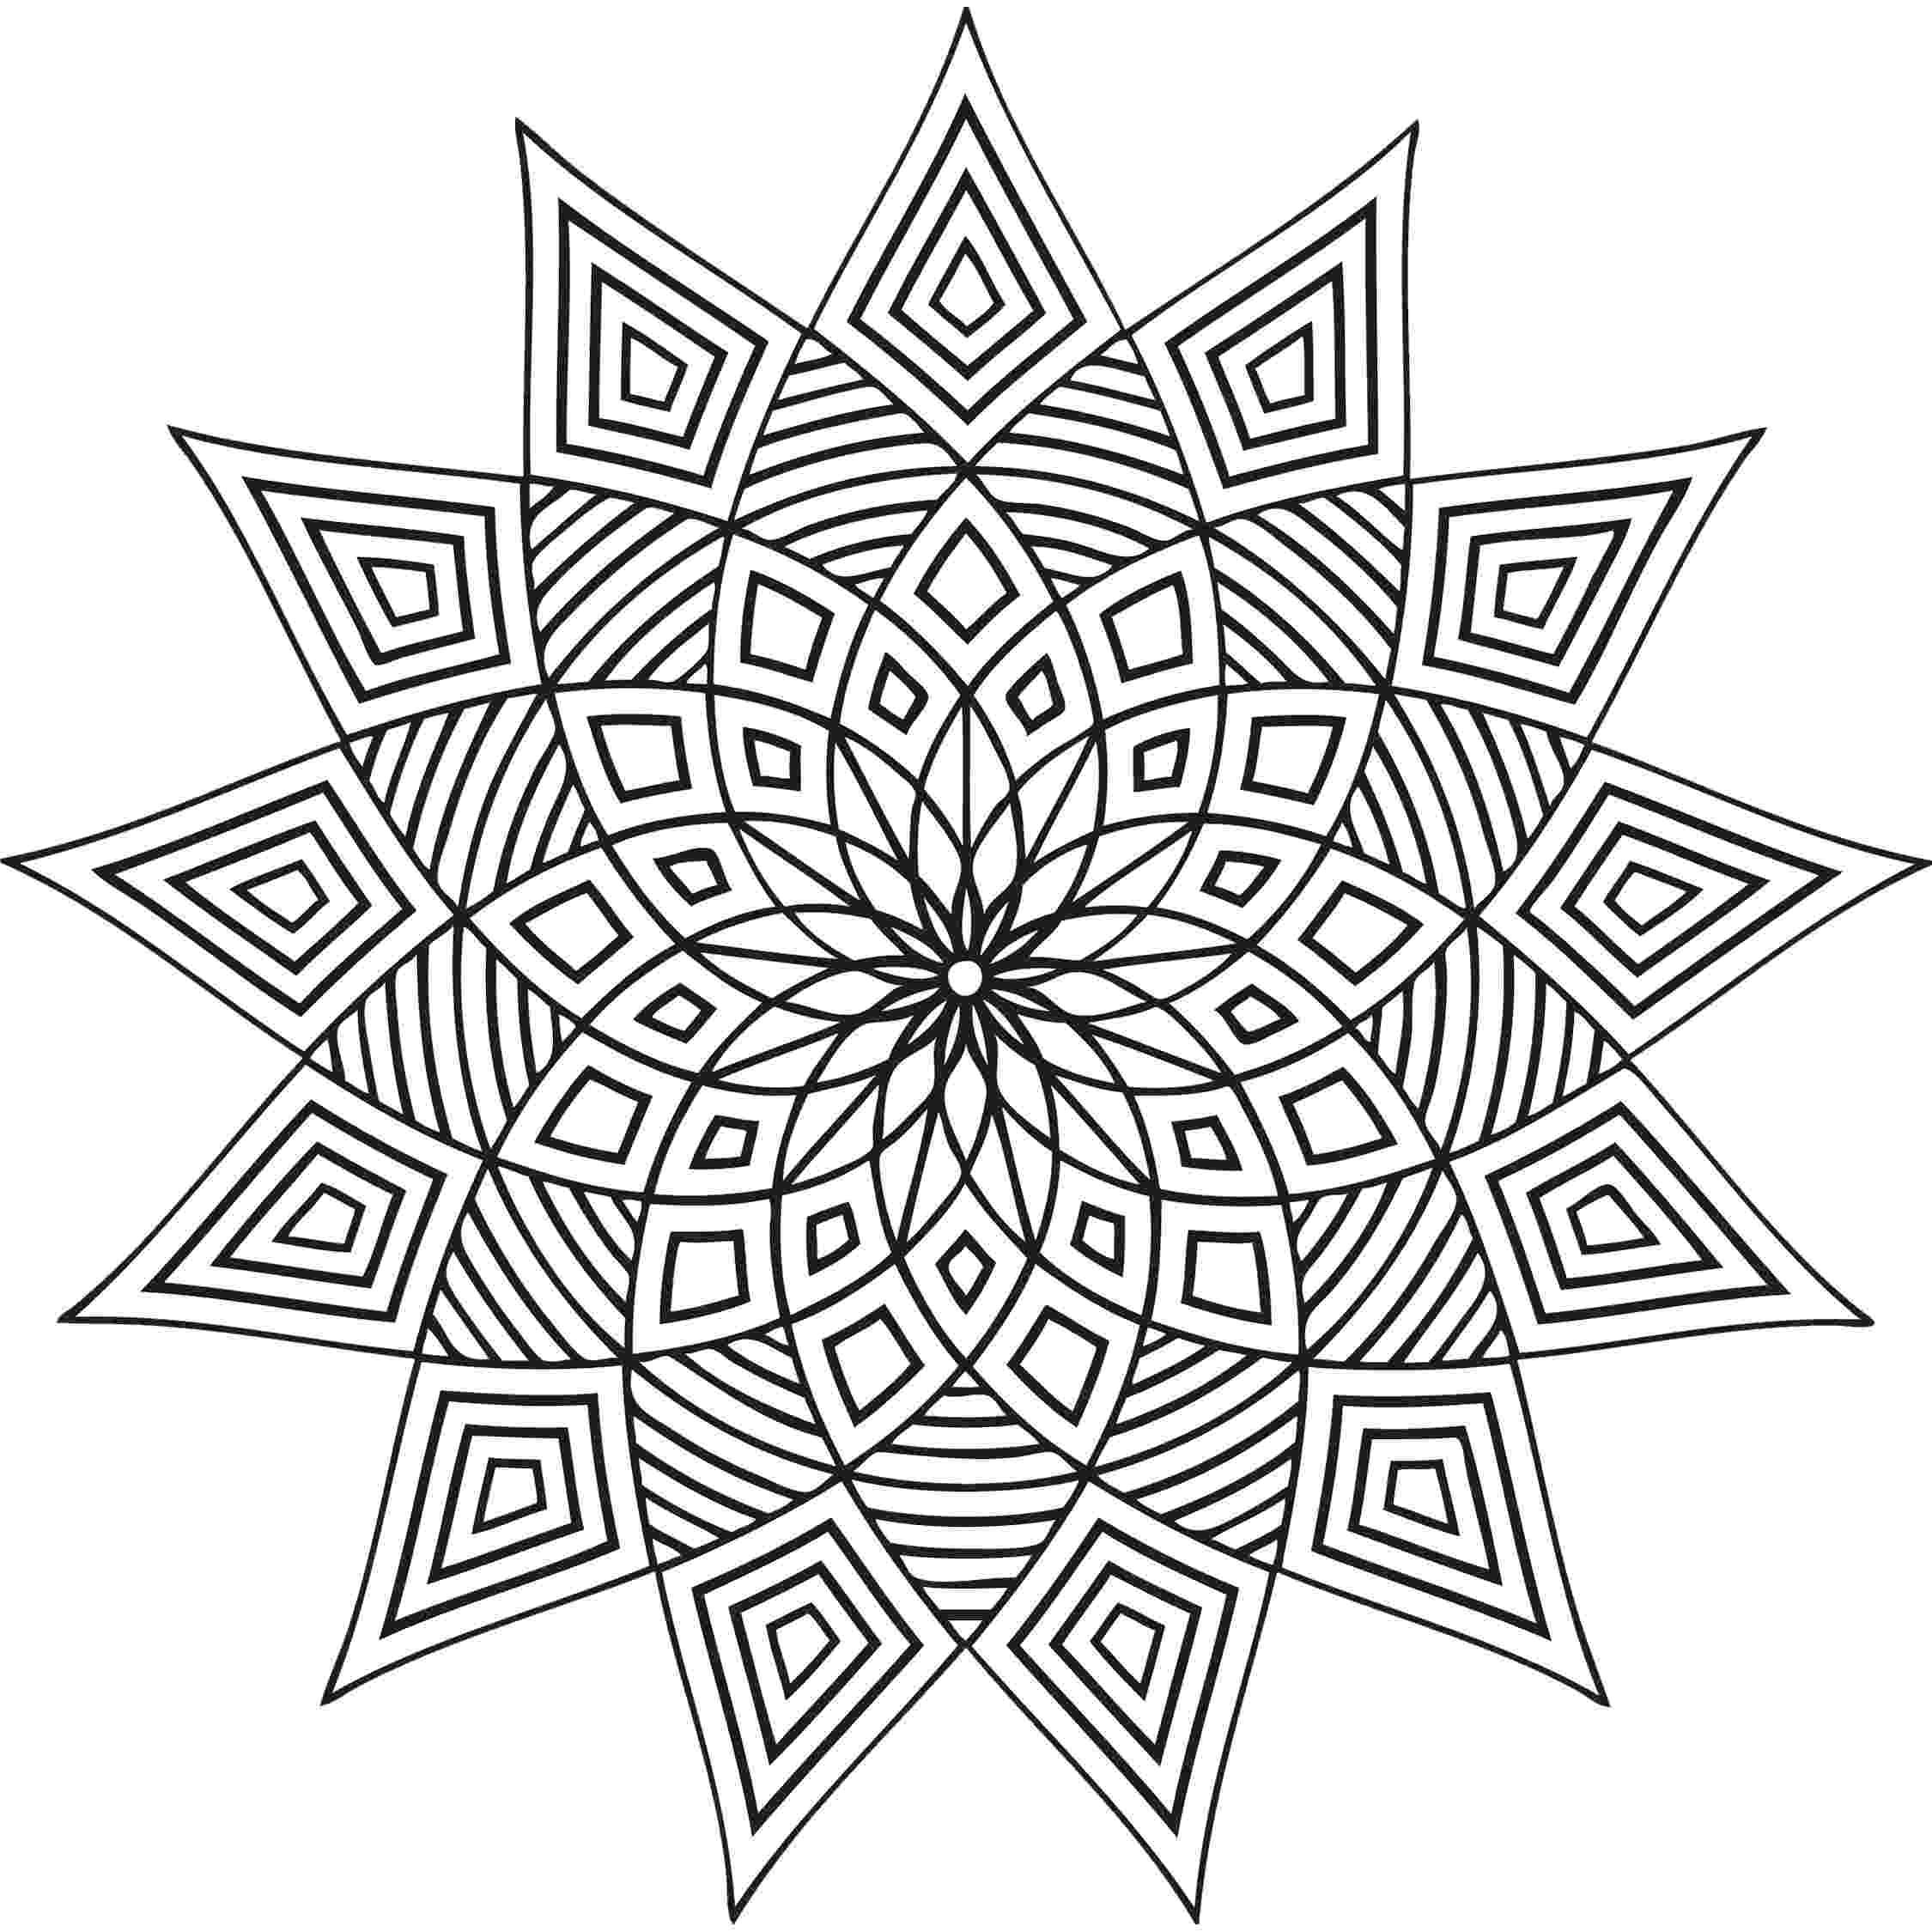 design coloring page free printable geometric coloring pages for adults page coloring design